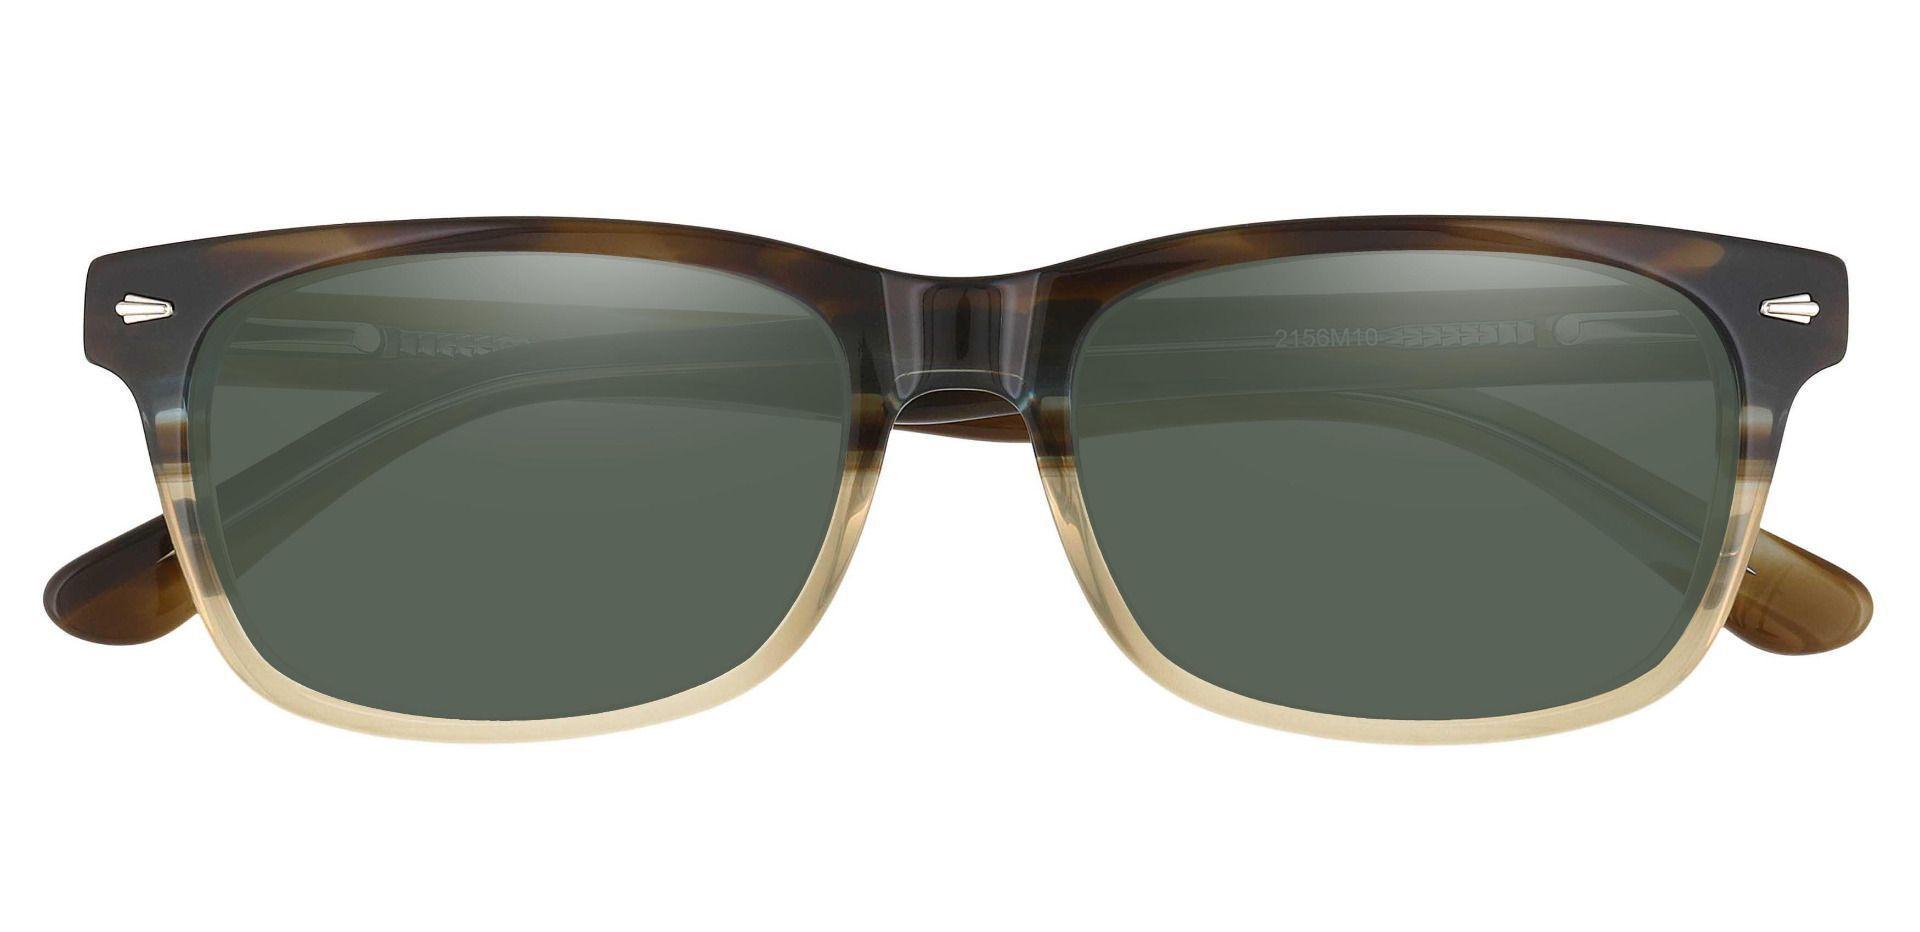 Hendrix Rectangle Non-Rx Sunglasses - Multi Color Frame With Green Lenses